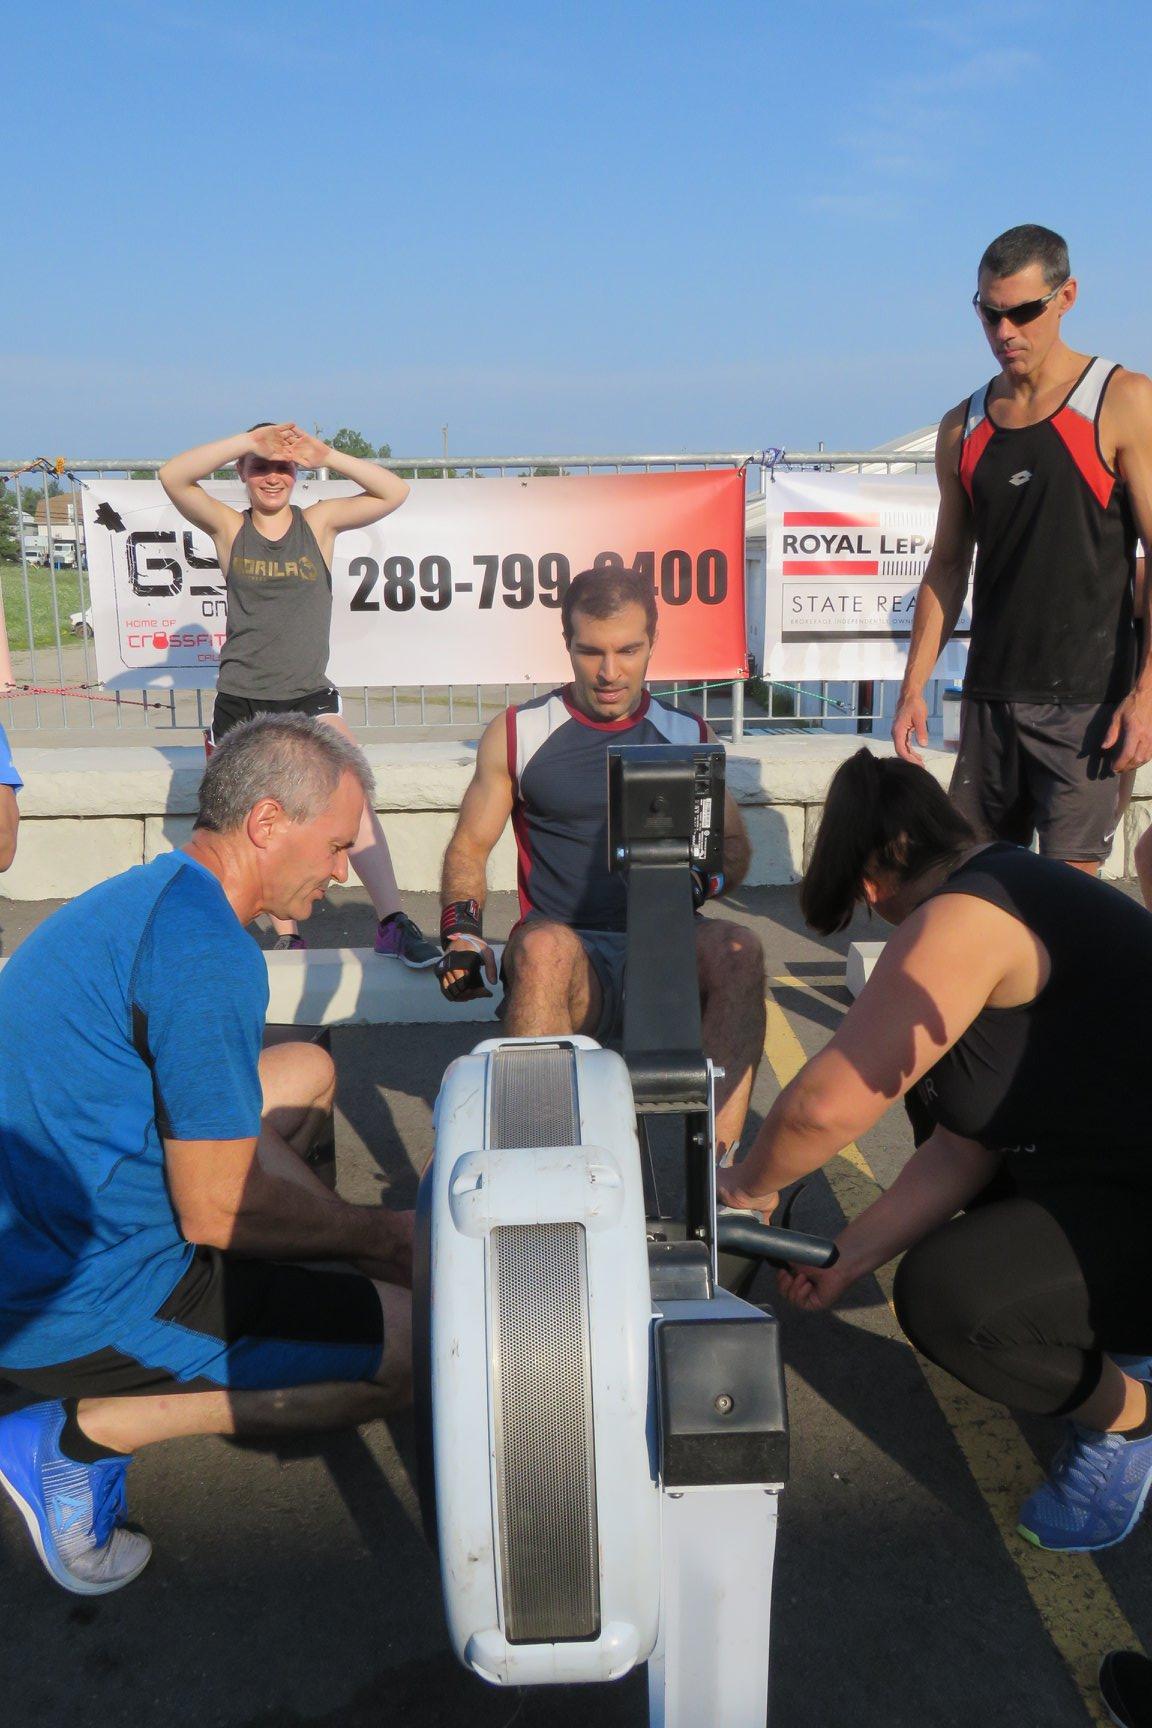 Rowing Marathon